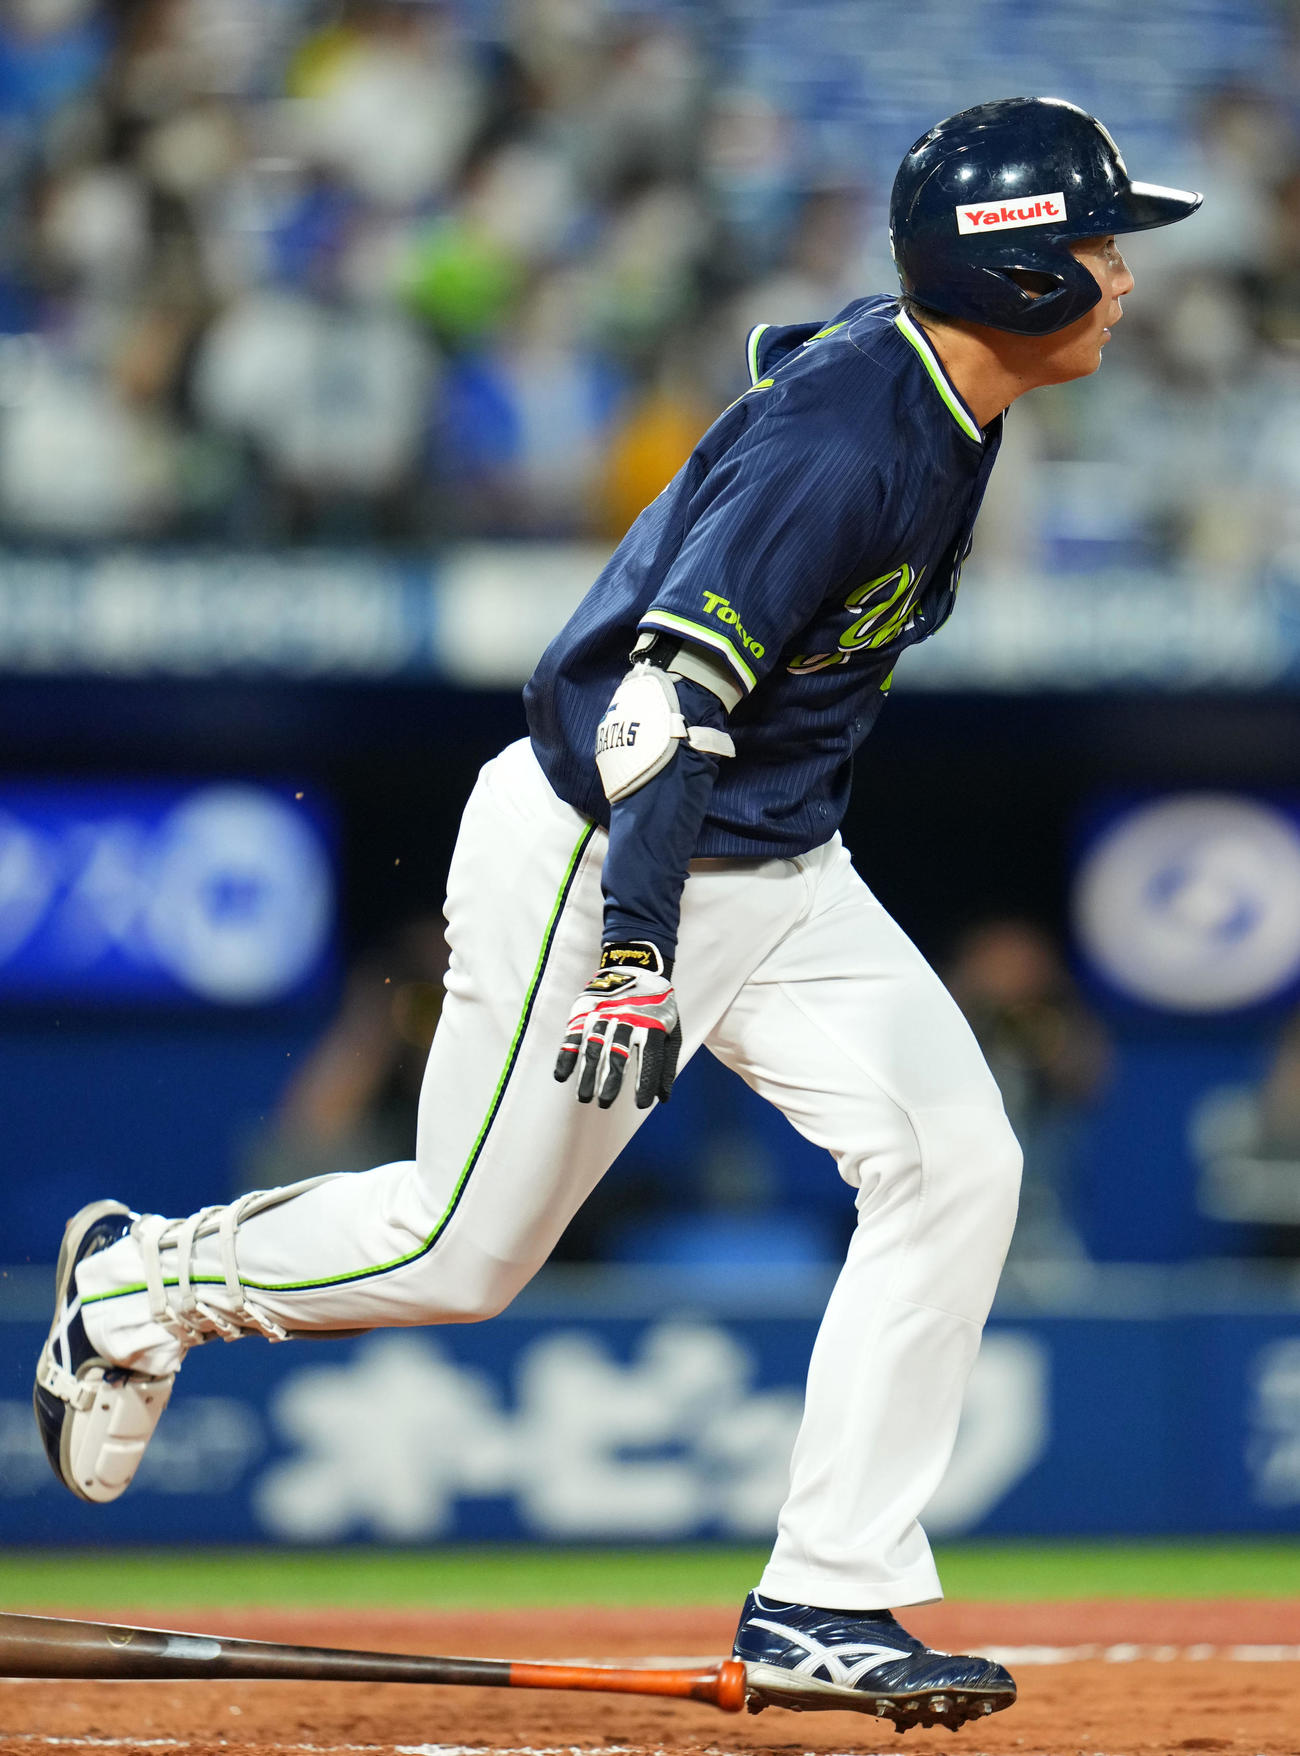 DeNA対ヤクルト 9回表ヤクルト無死、左前二塁打を放つ川端(撮影・横山健太)